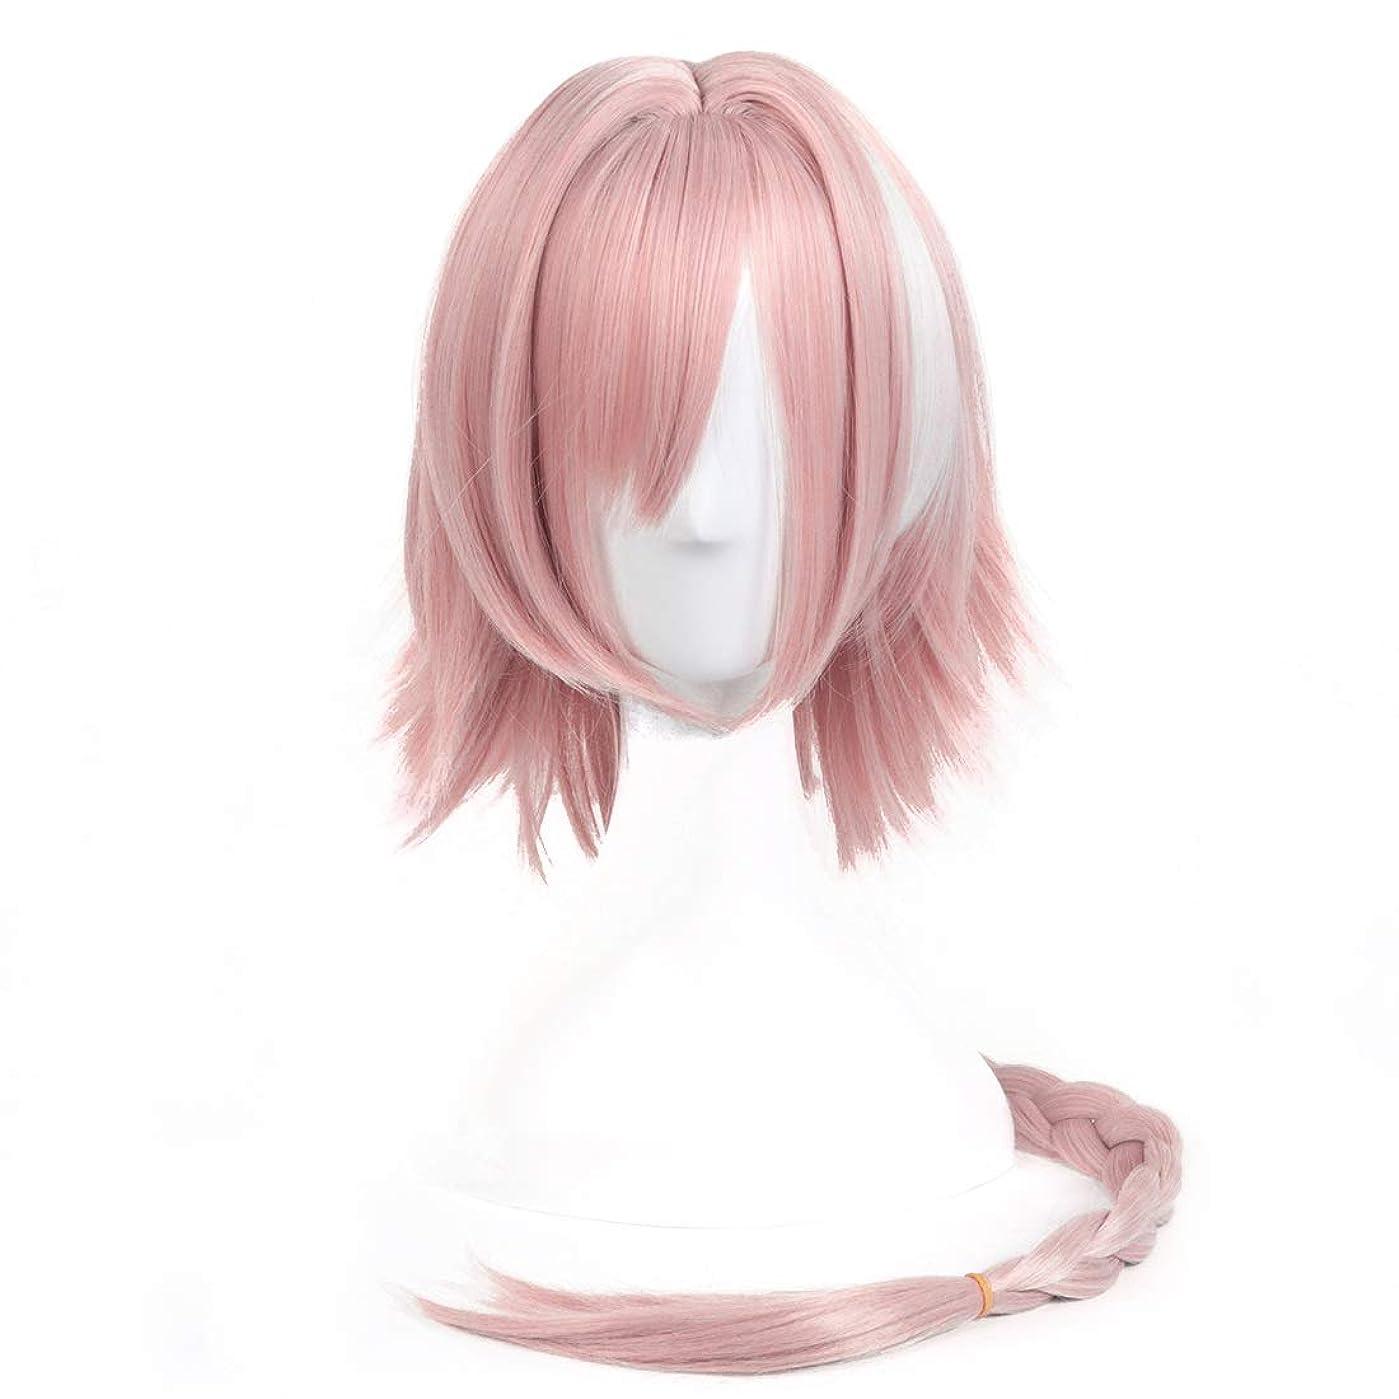 Fate/ApocryphaのアニメキャラクターAstolfo Wigコスプレウィッグ (Color : Cherry powder)